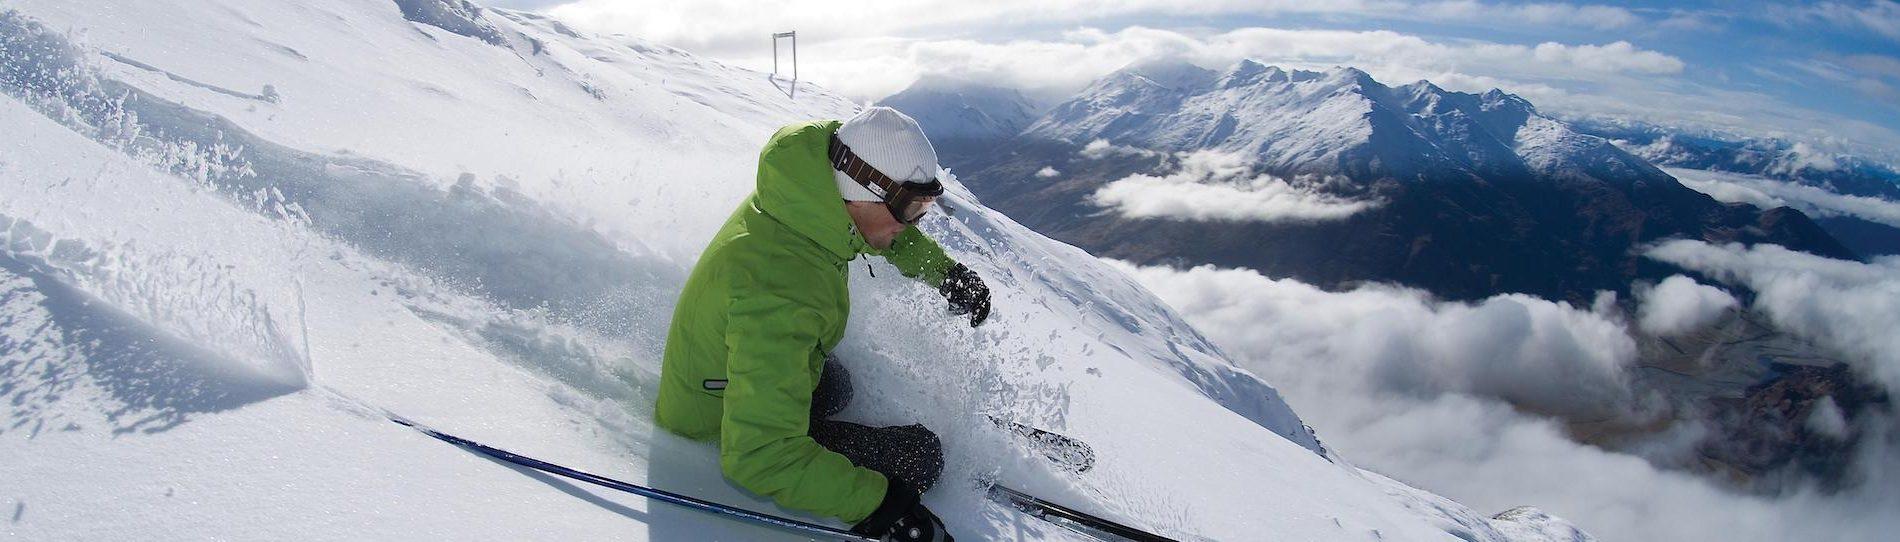 buck snowboarding slopes